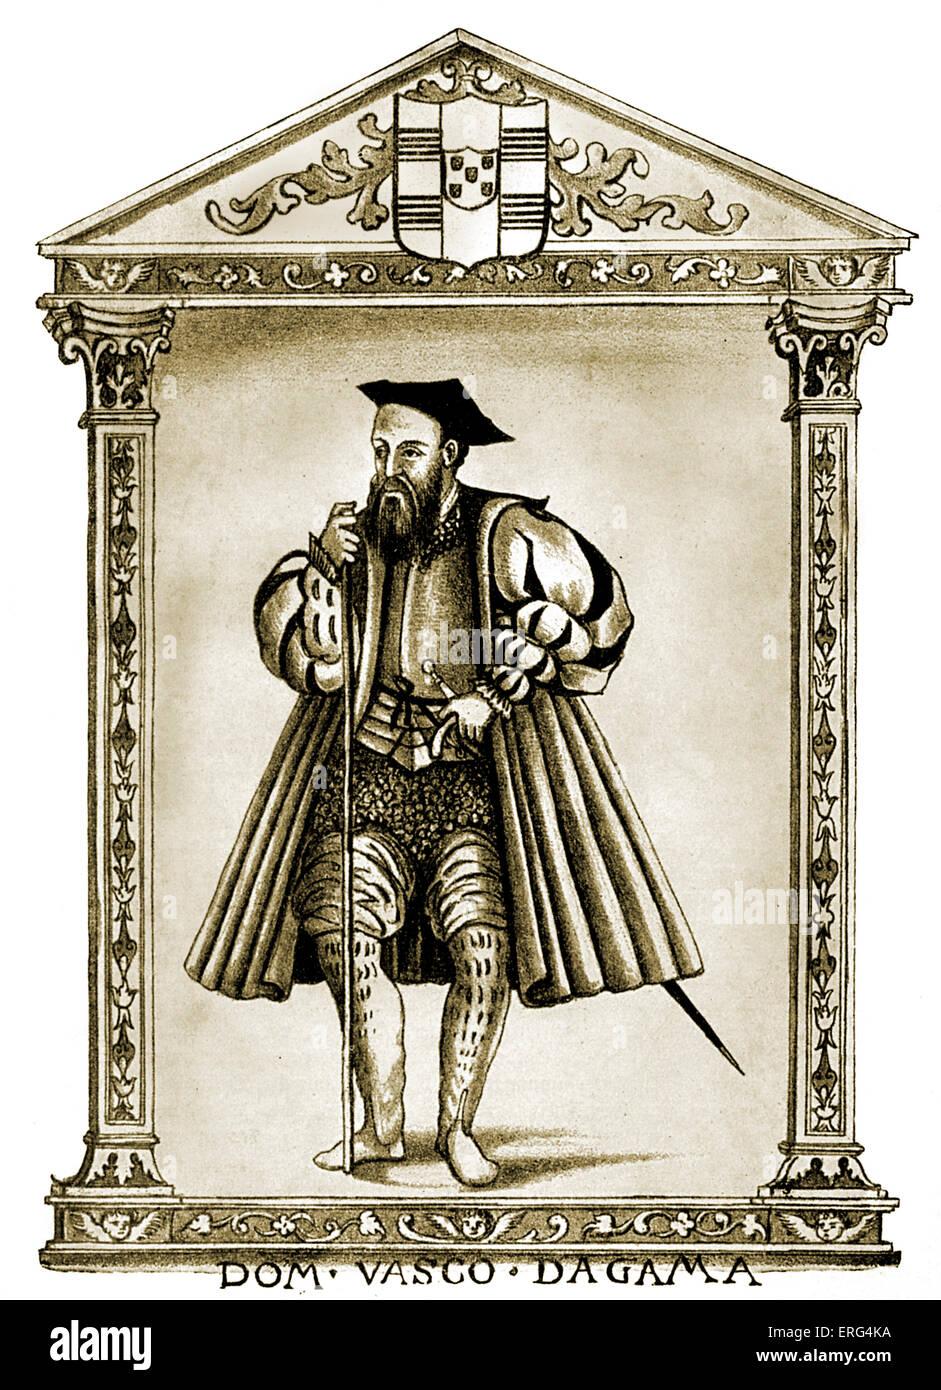 Vasco de Gama, in 'Lendas da India par Gaspar Correa'.  VdG Portuguese explorer 1460 - 24 December 1524. - Stock Image